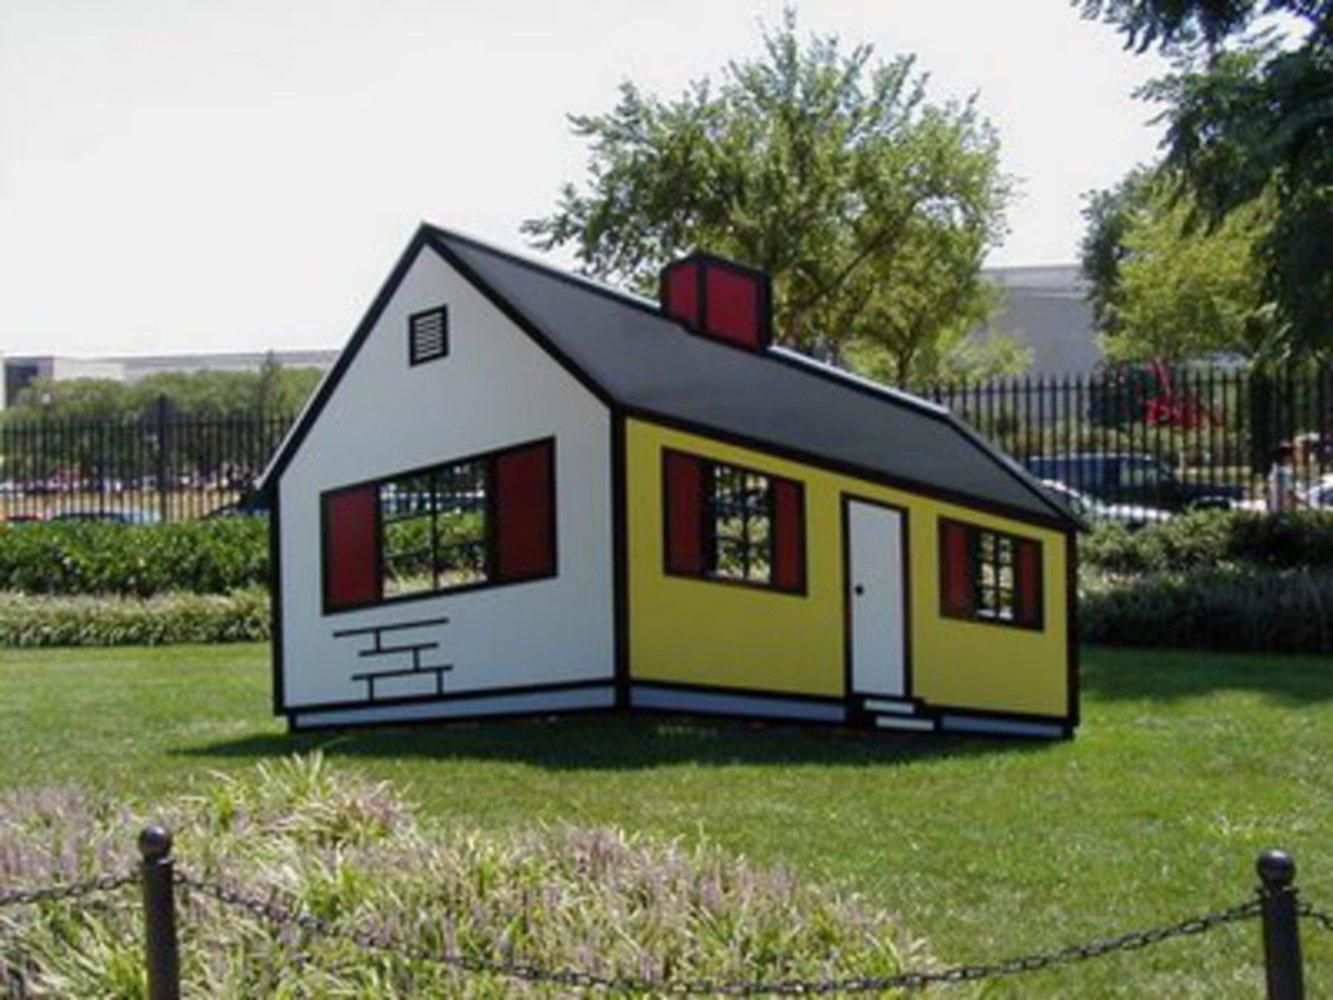 Hollow house 1.thumb